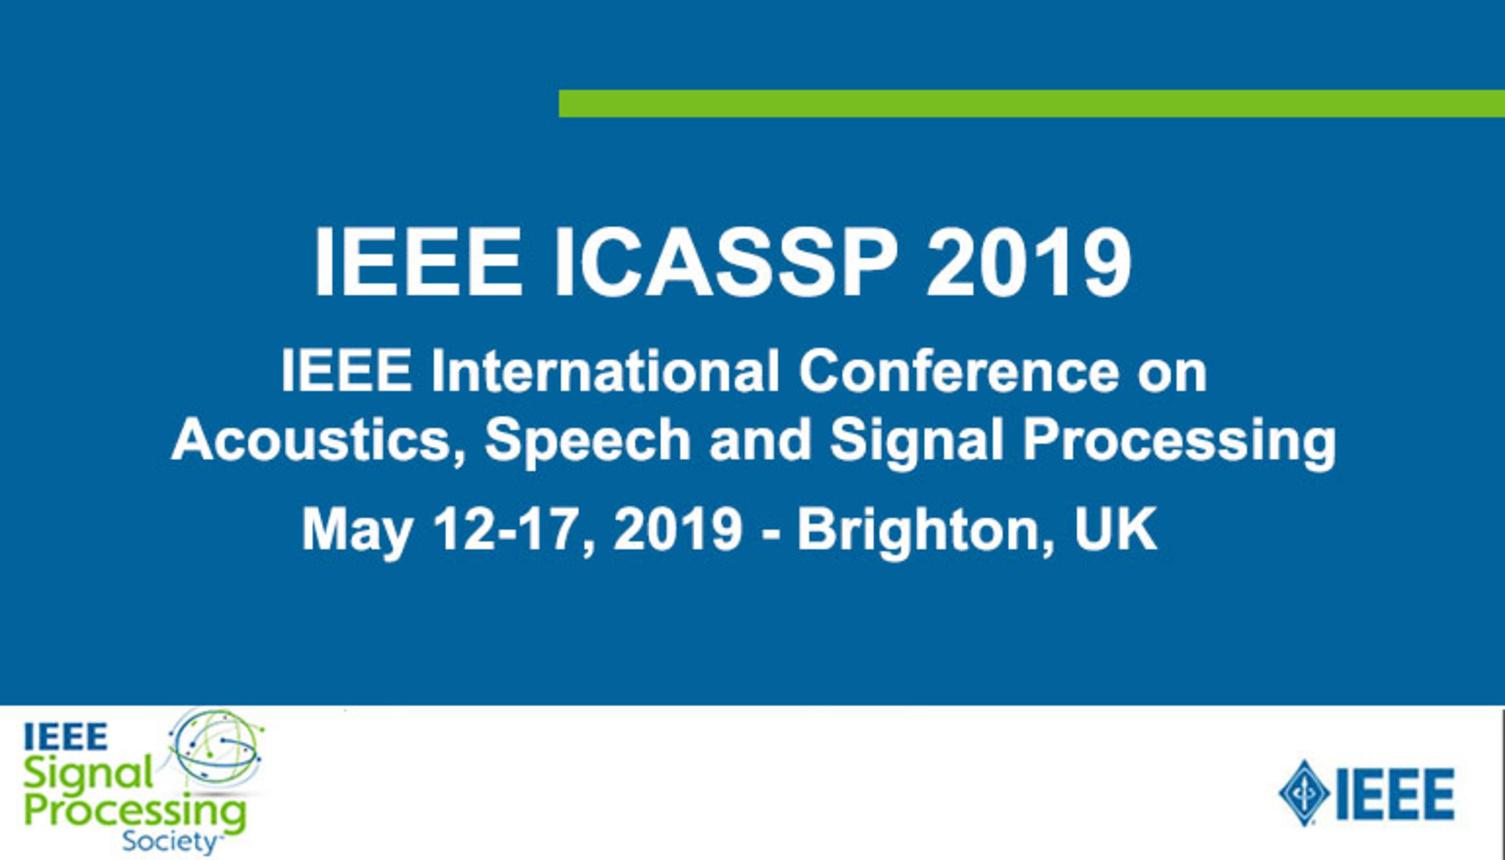 ICASSP 2019 Opening Ceremony: Ali H. Sayed